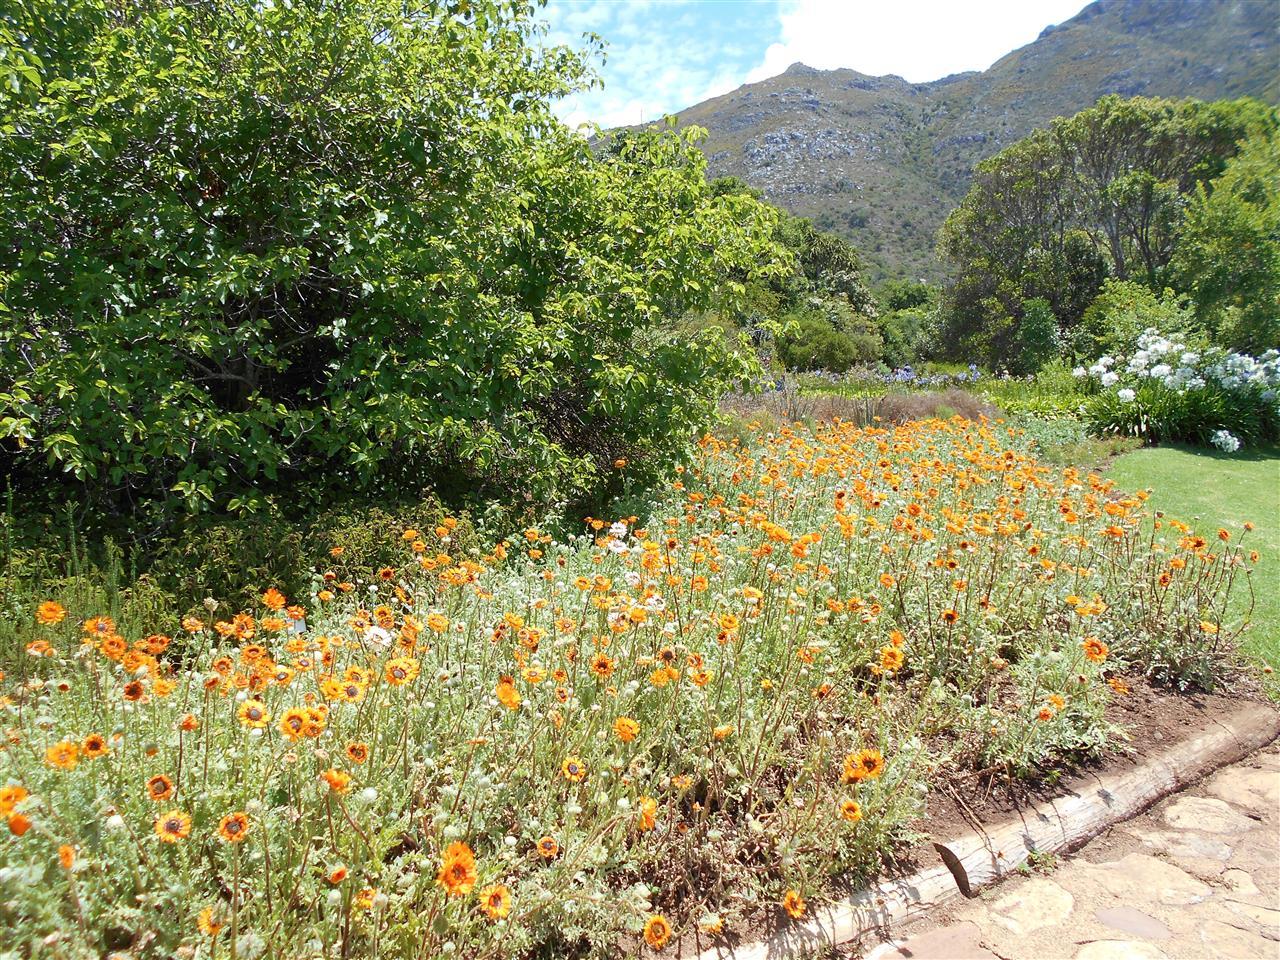 Cape Town, South Africa - summer flowers in Kirstenbosch Botanical Gardens